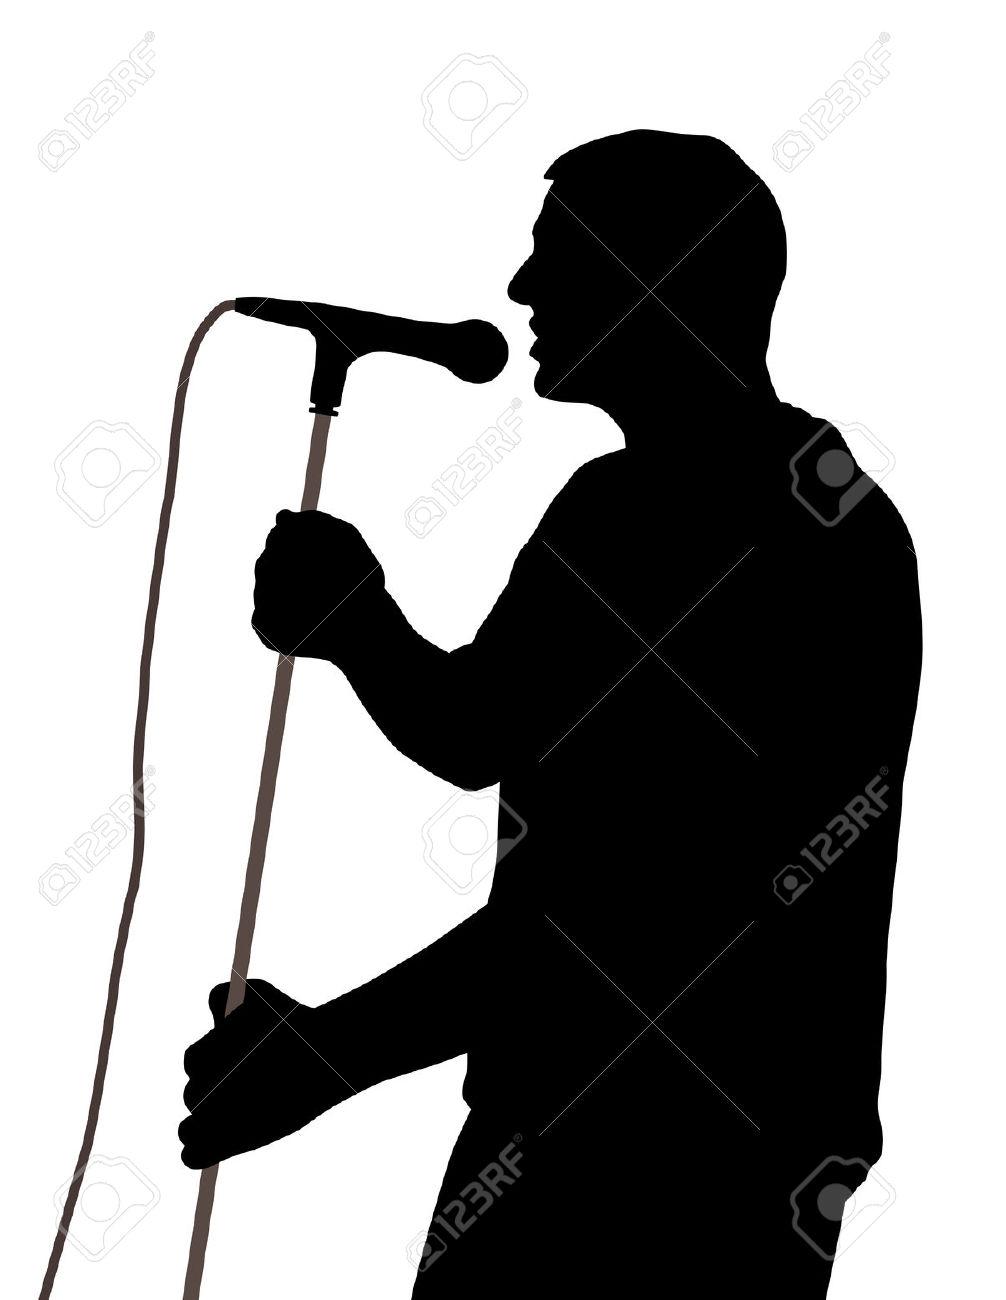 Karaoke singer clipart royalty free download Karaoke Singer Clipart | Free download best Karaoke Singer ... royalty free download